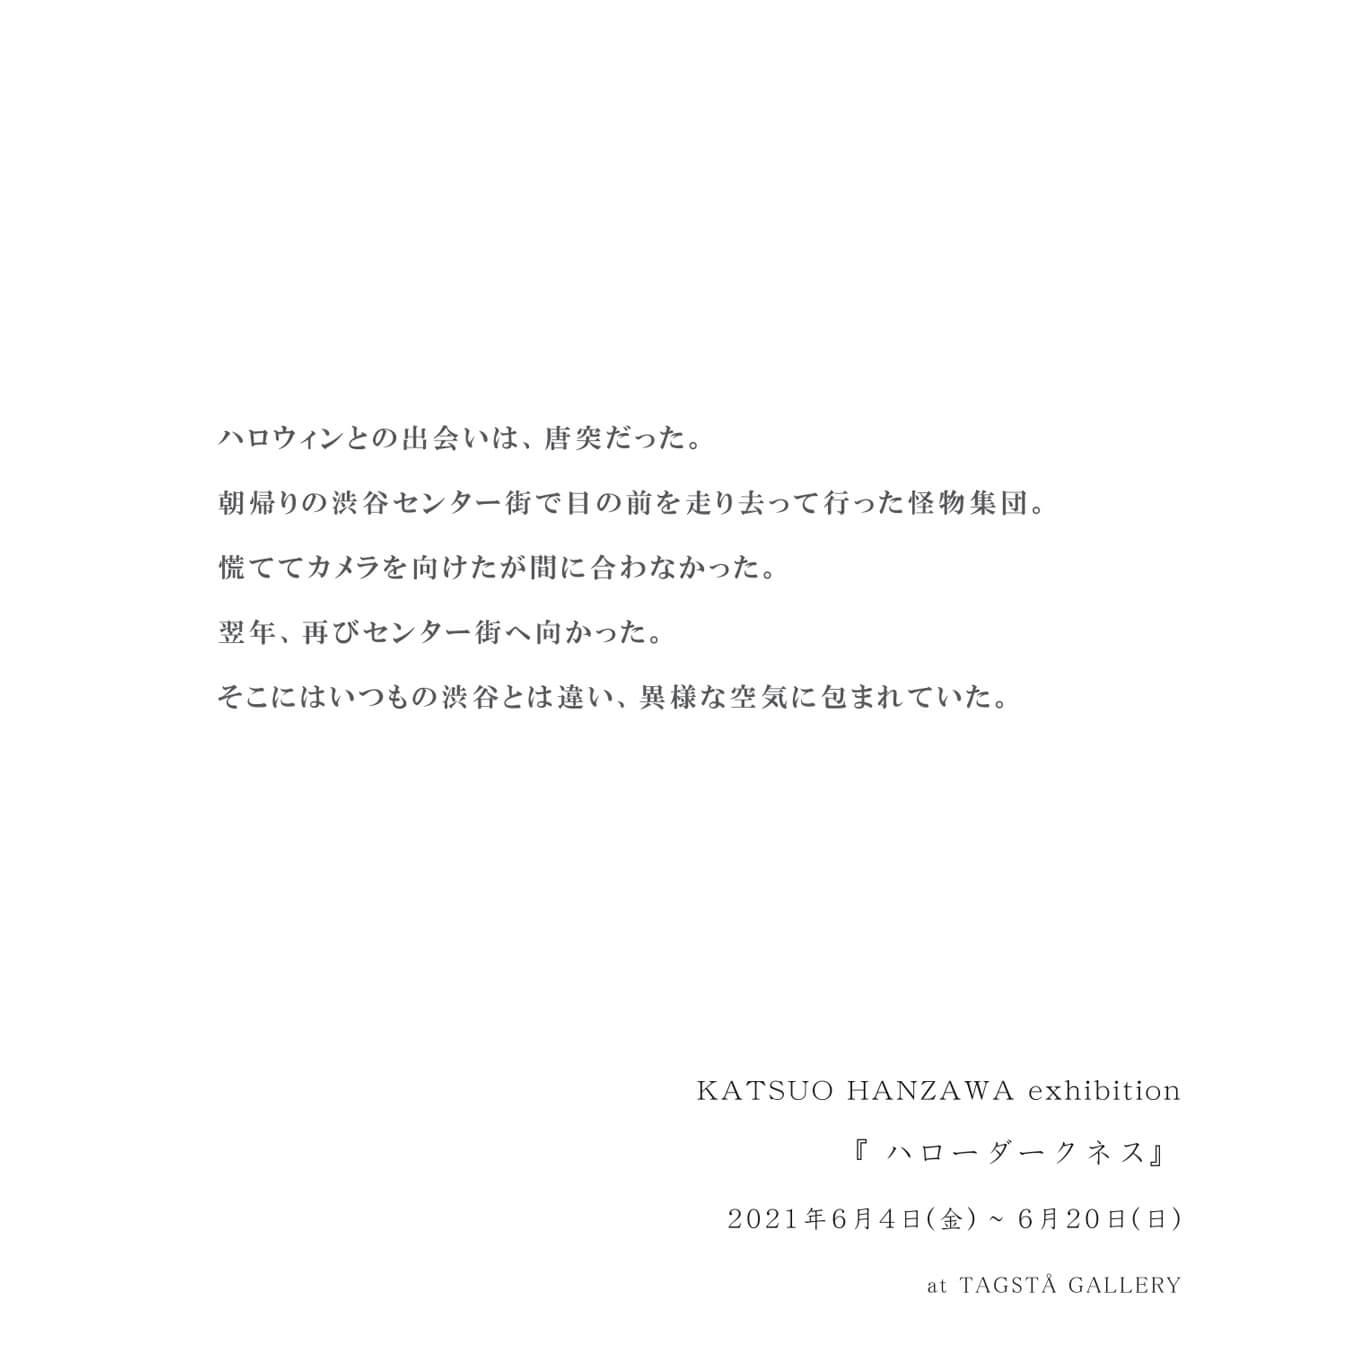 tagsta-202106-半沢克夫 展覧会